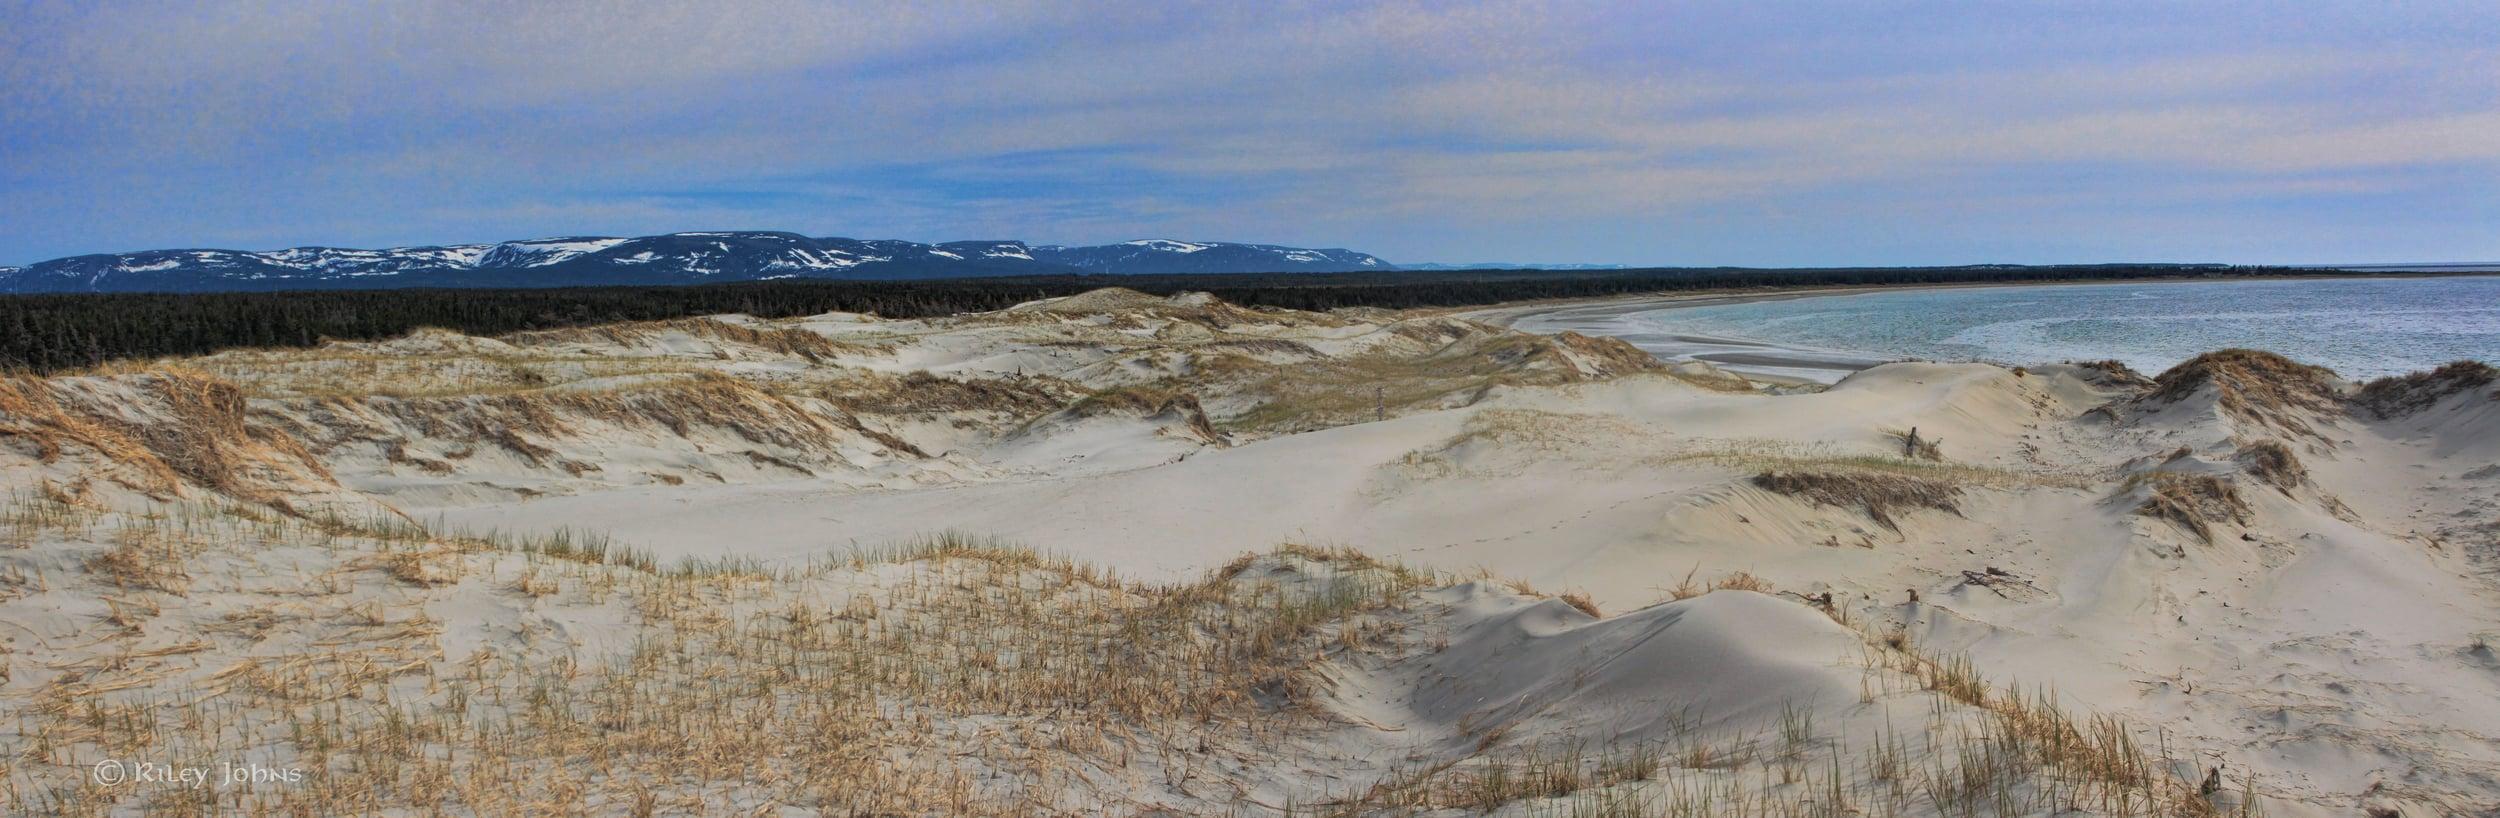 Newfoundland, Canada : Where dunes, ocean, and mountains meet.